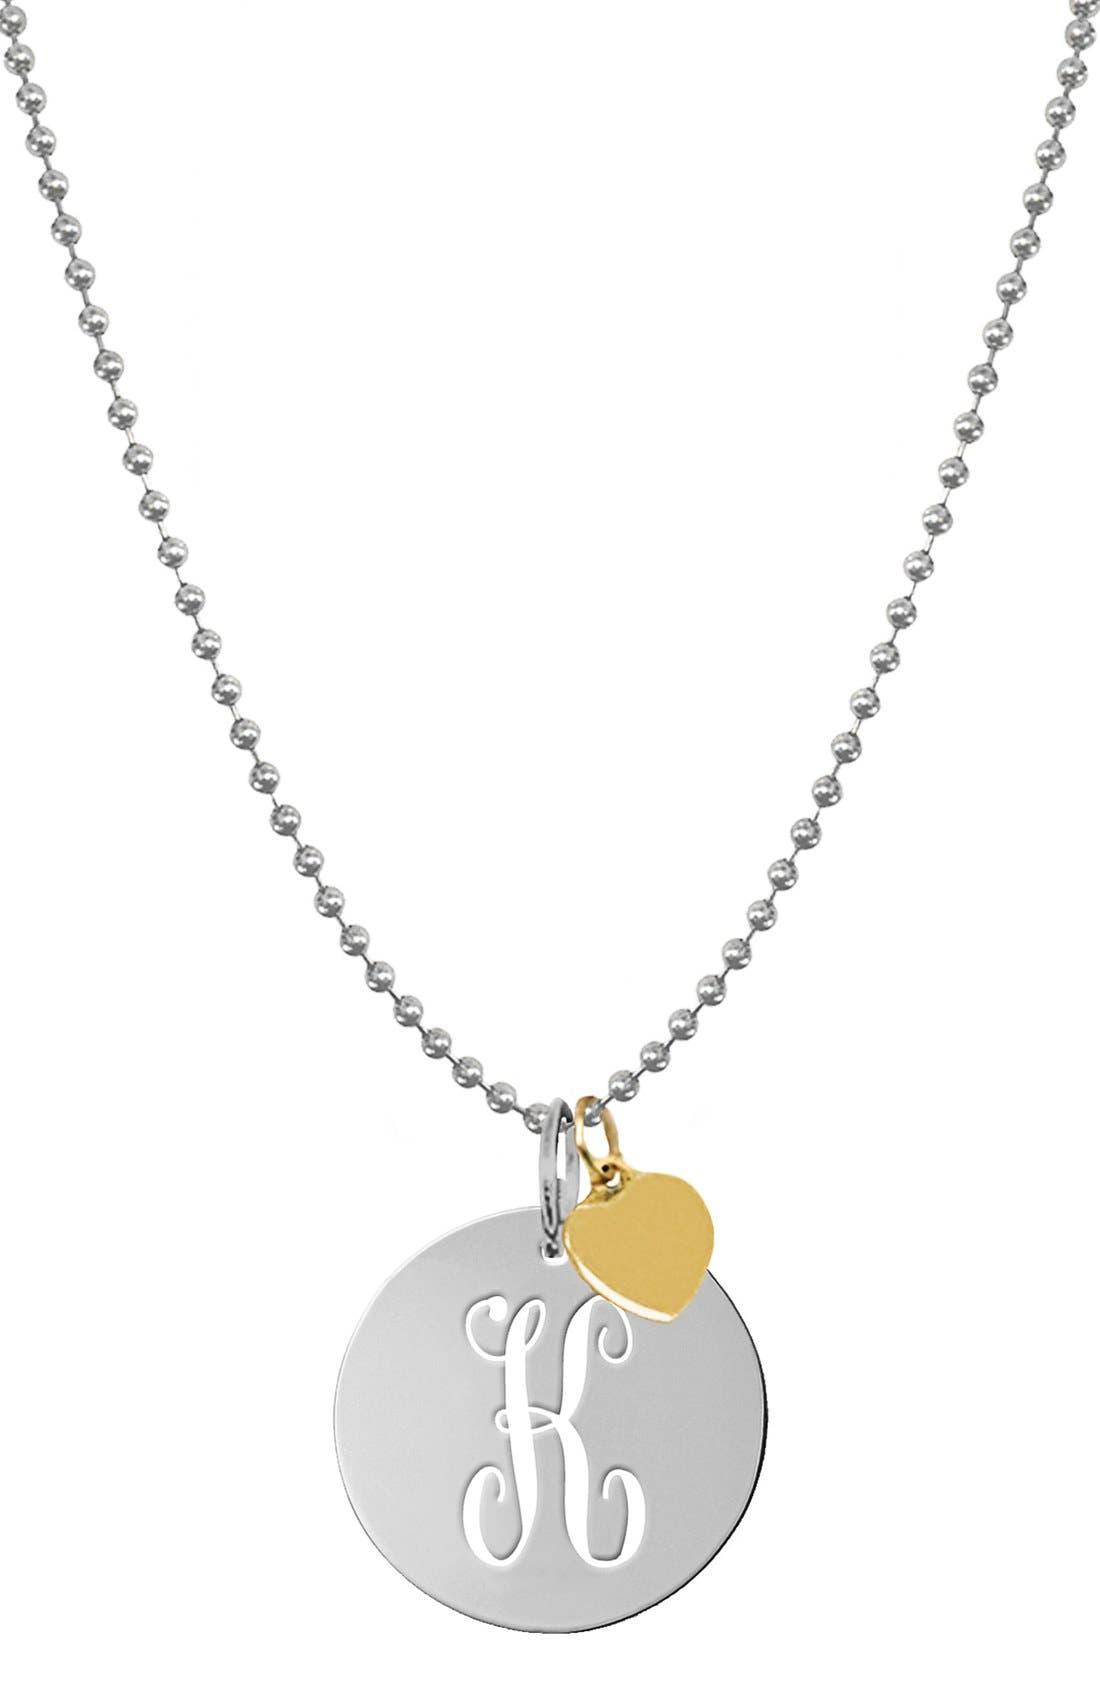 Jane Basch Designs Personalized Script Initial Disc Pendant Necklace